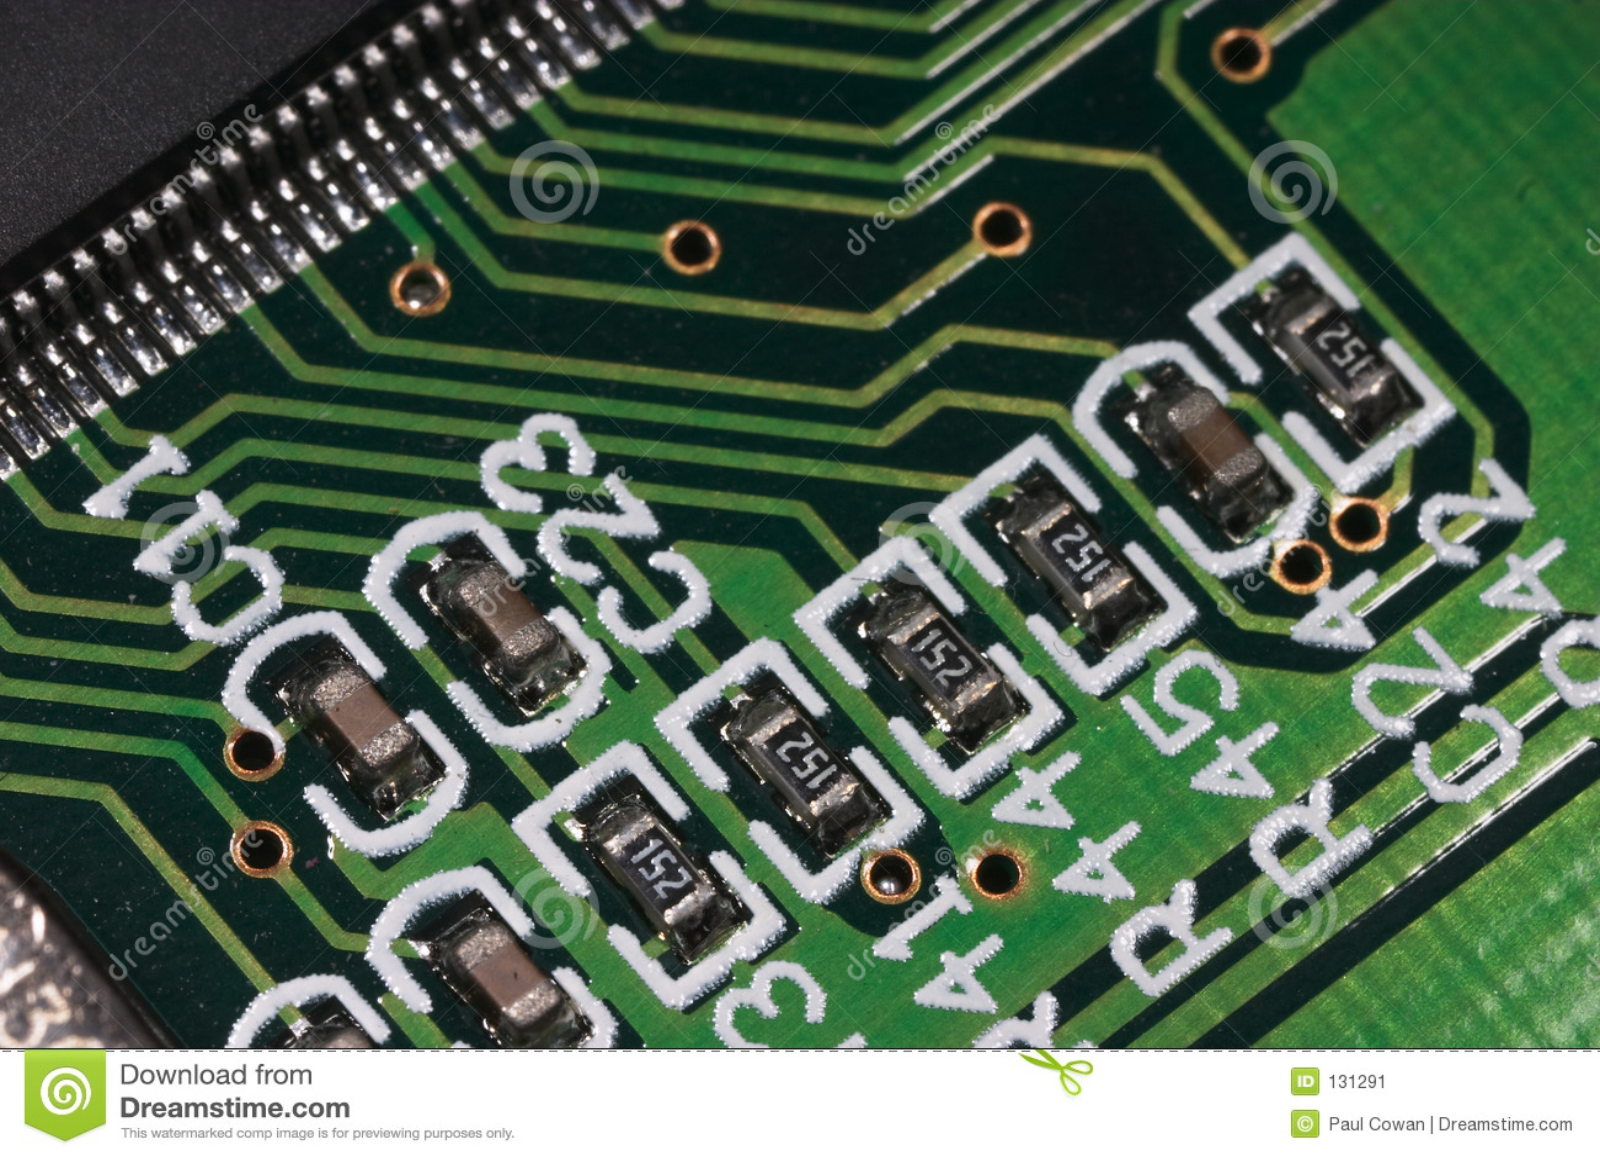 USB2 macro1